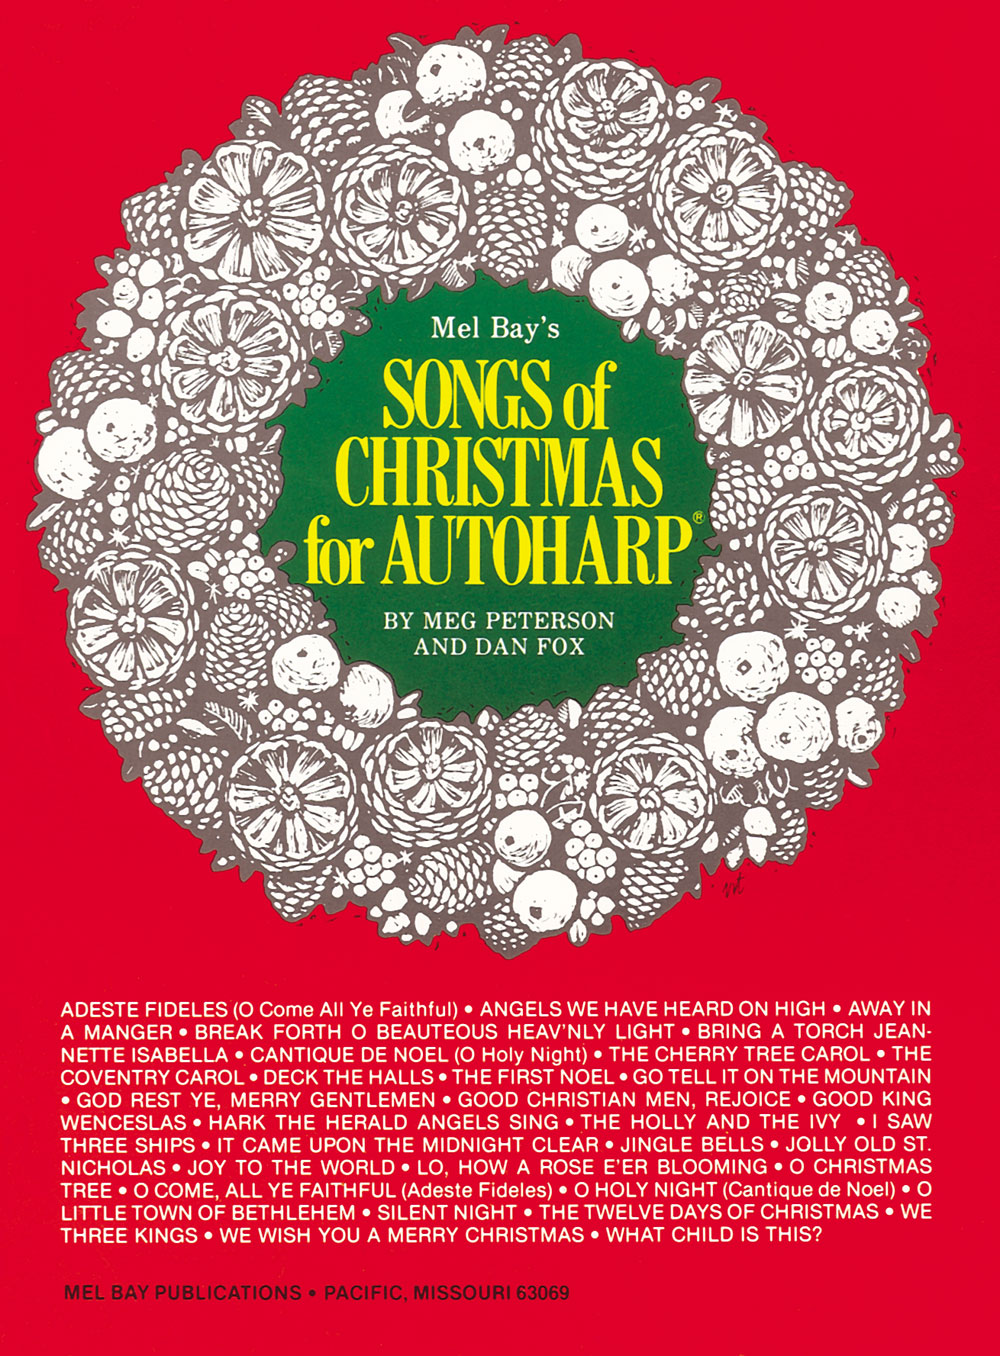 Songs of Christmas - Autoharp